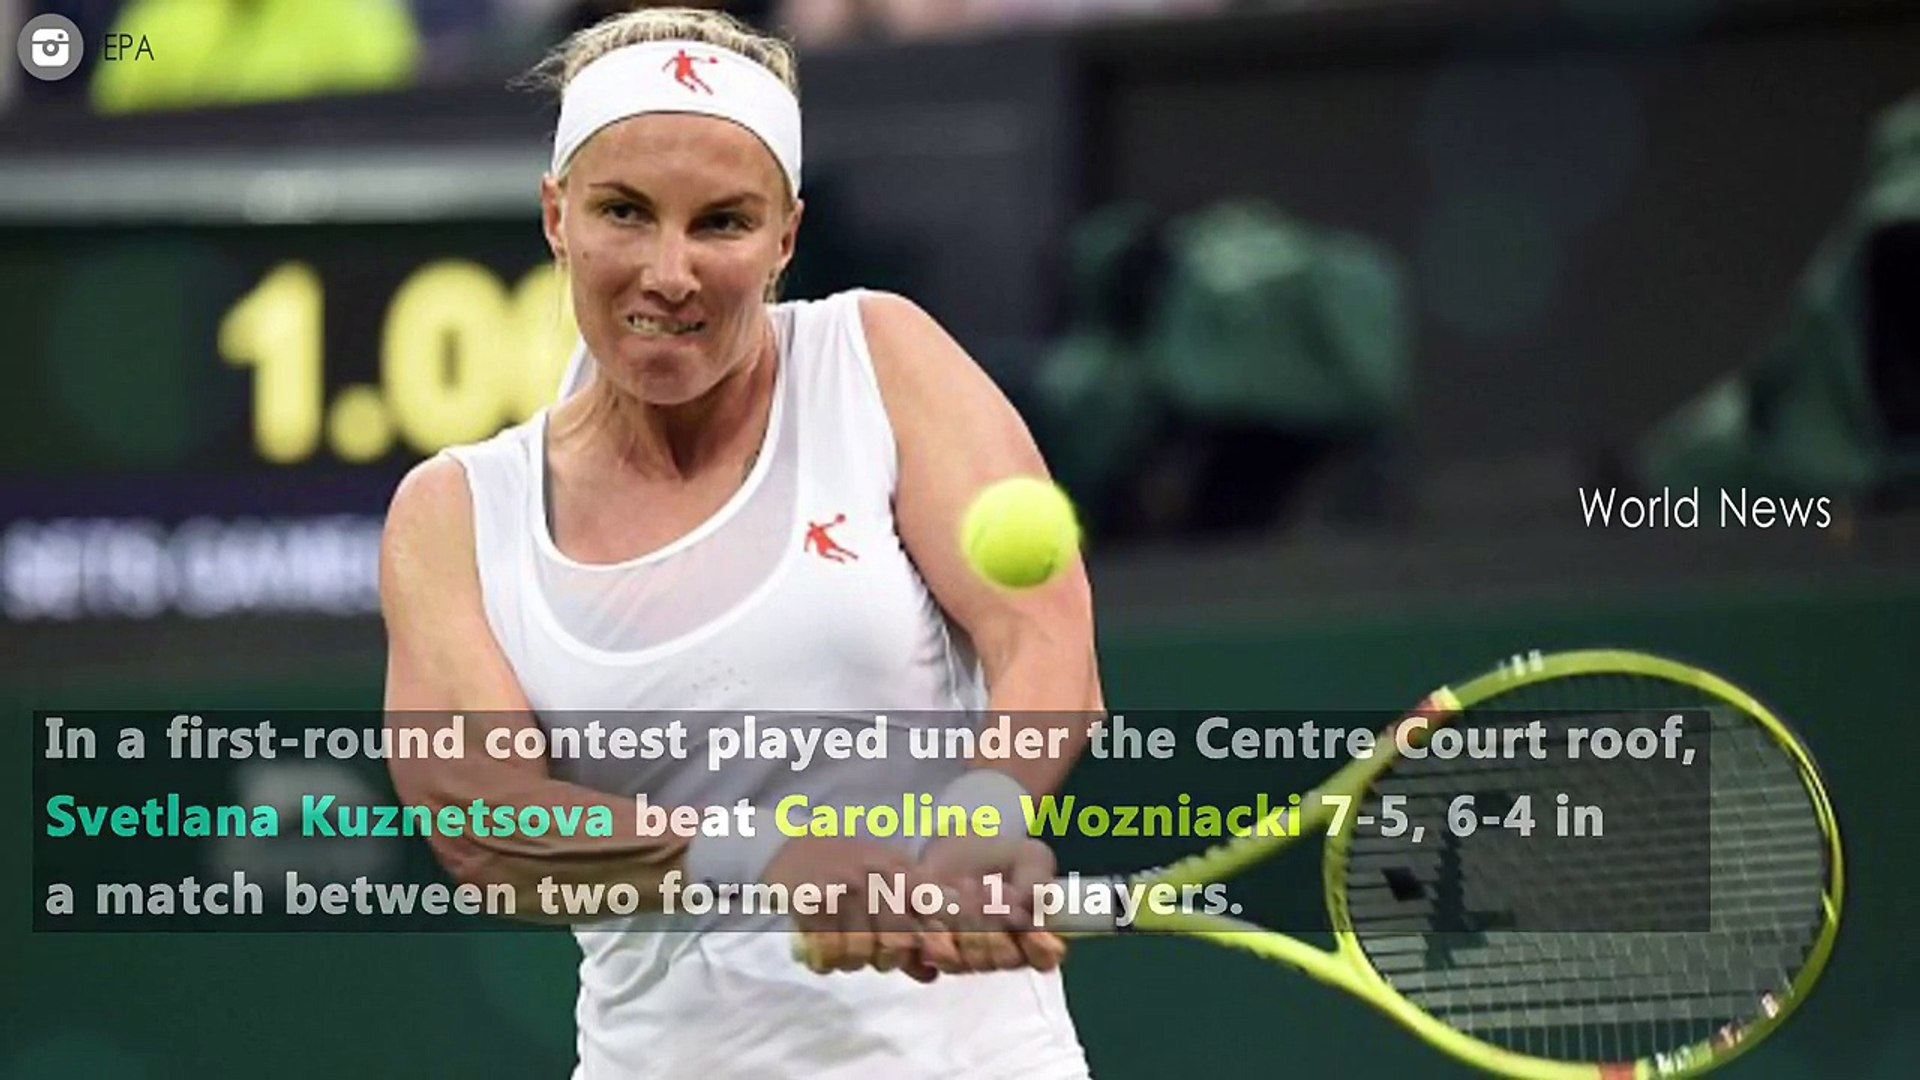 Svetlana Kuznetsova beats Caroline Wozniacki at Wimbledon